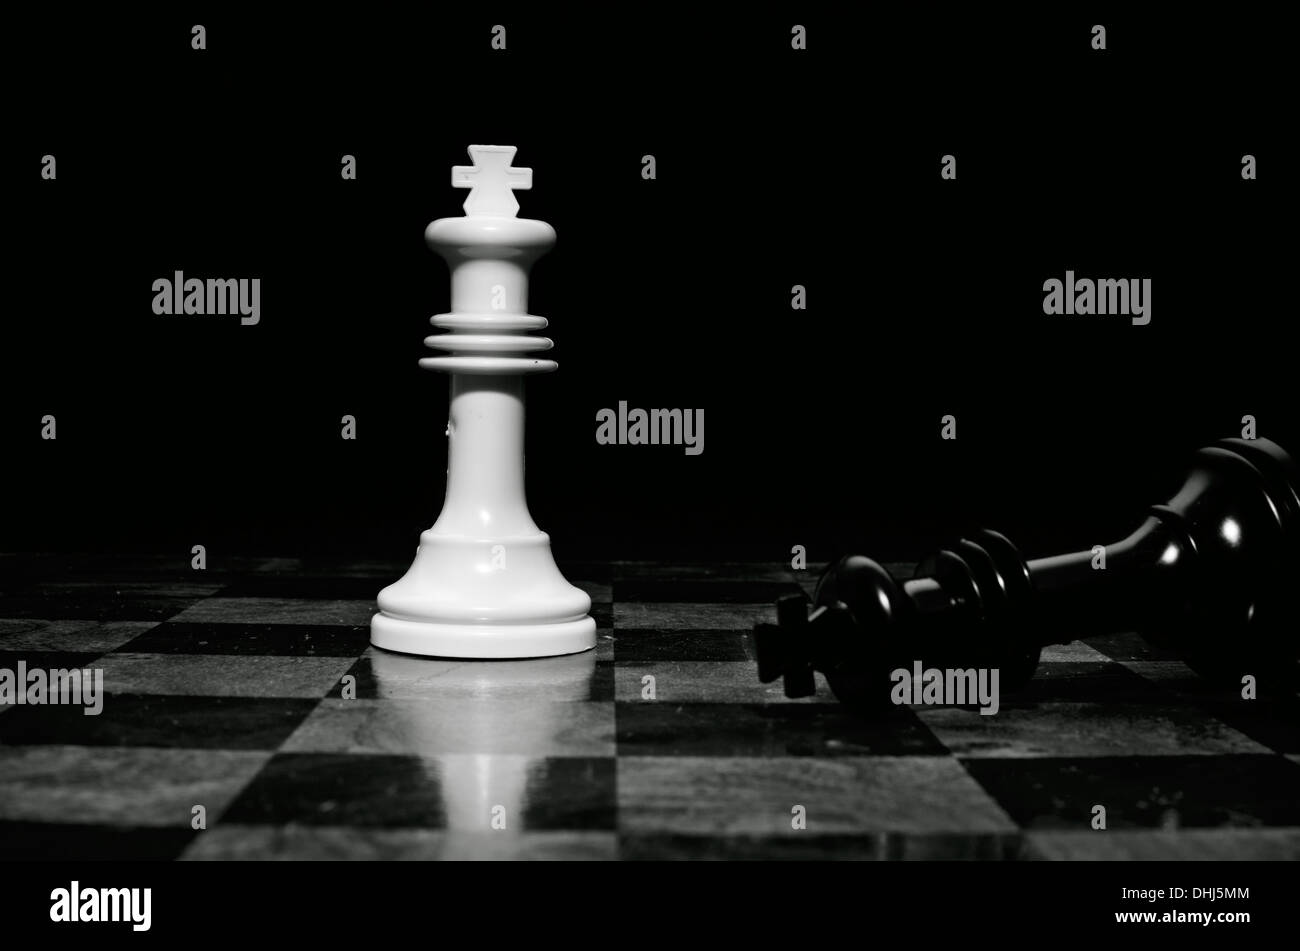 checkmate - Stock Image